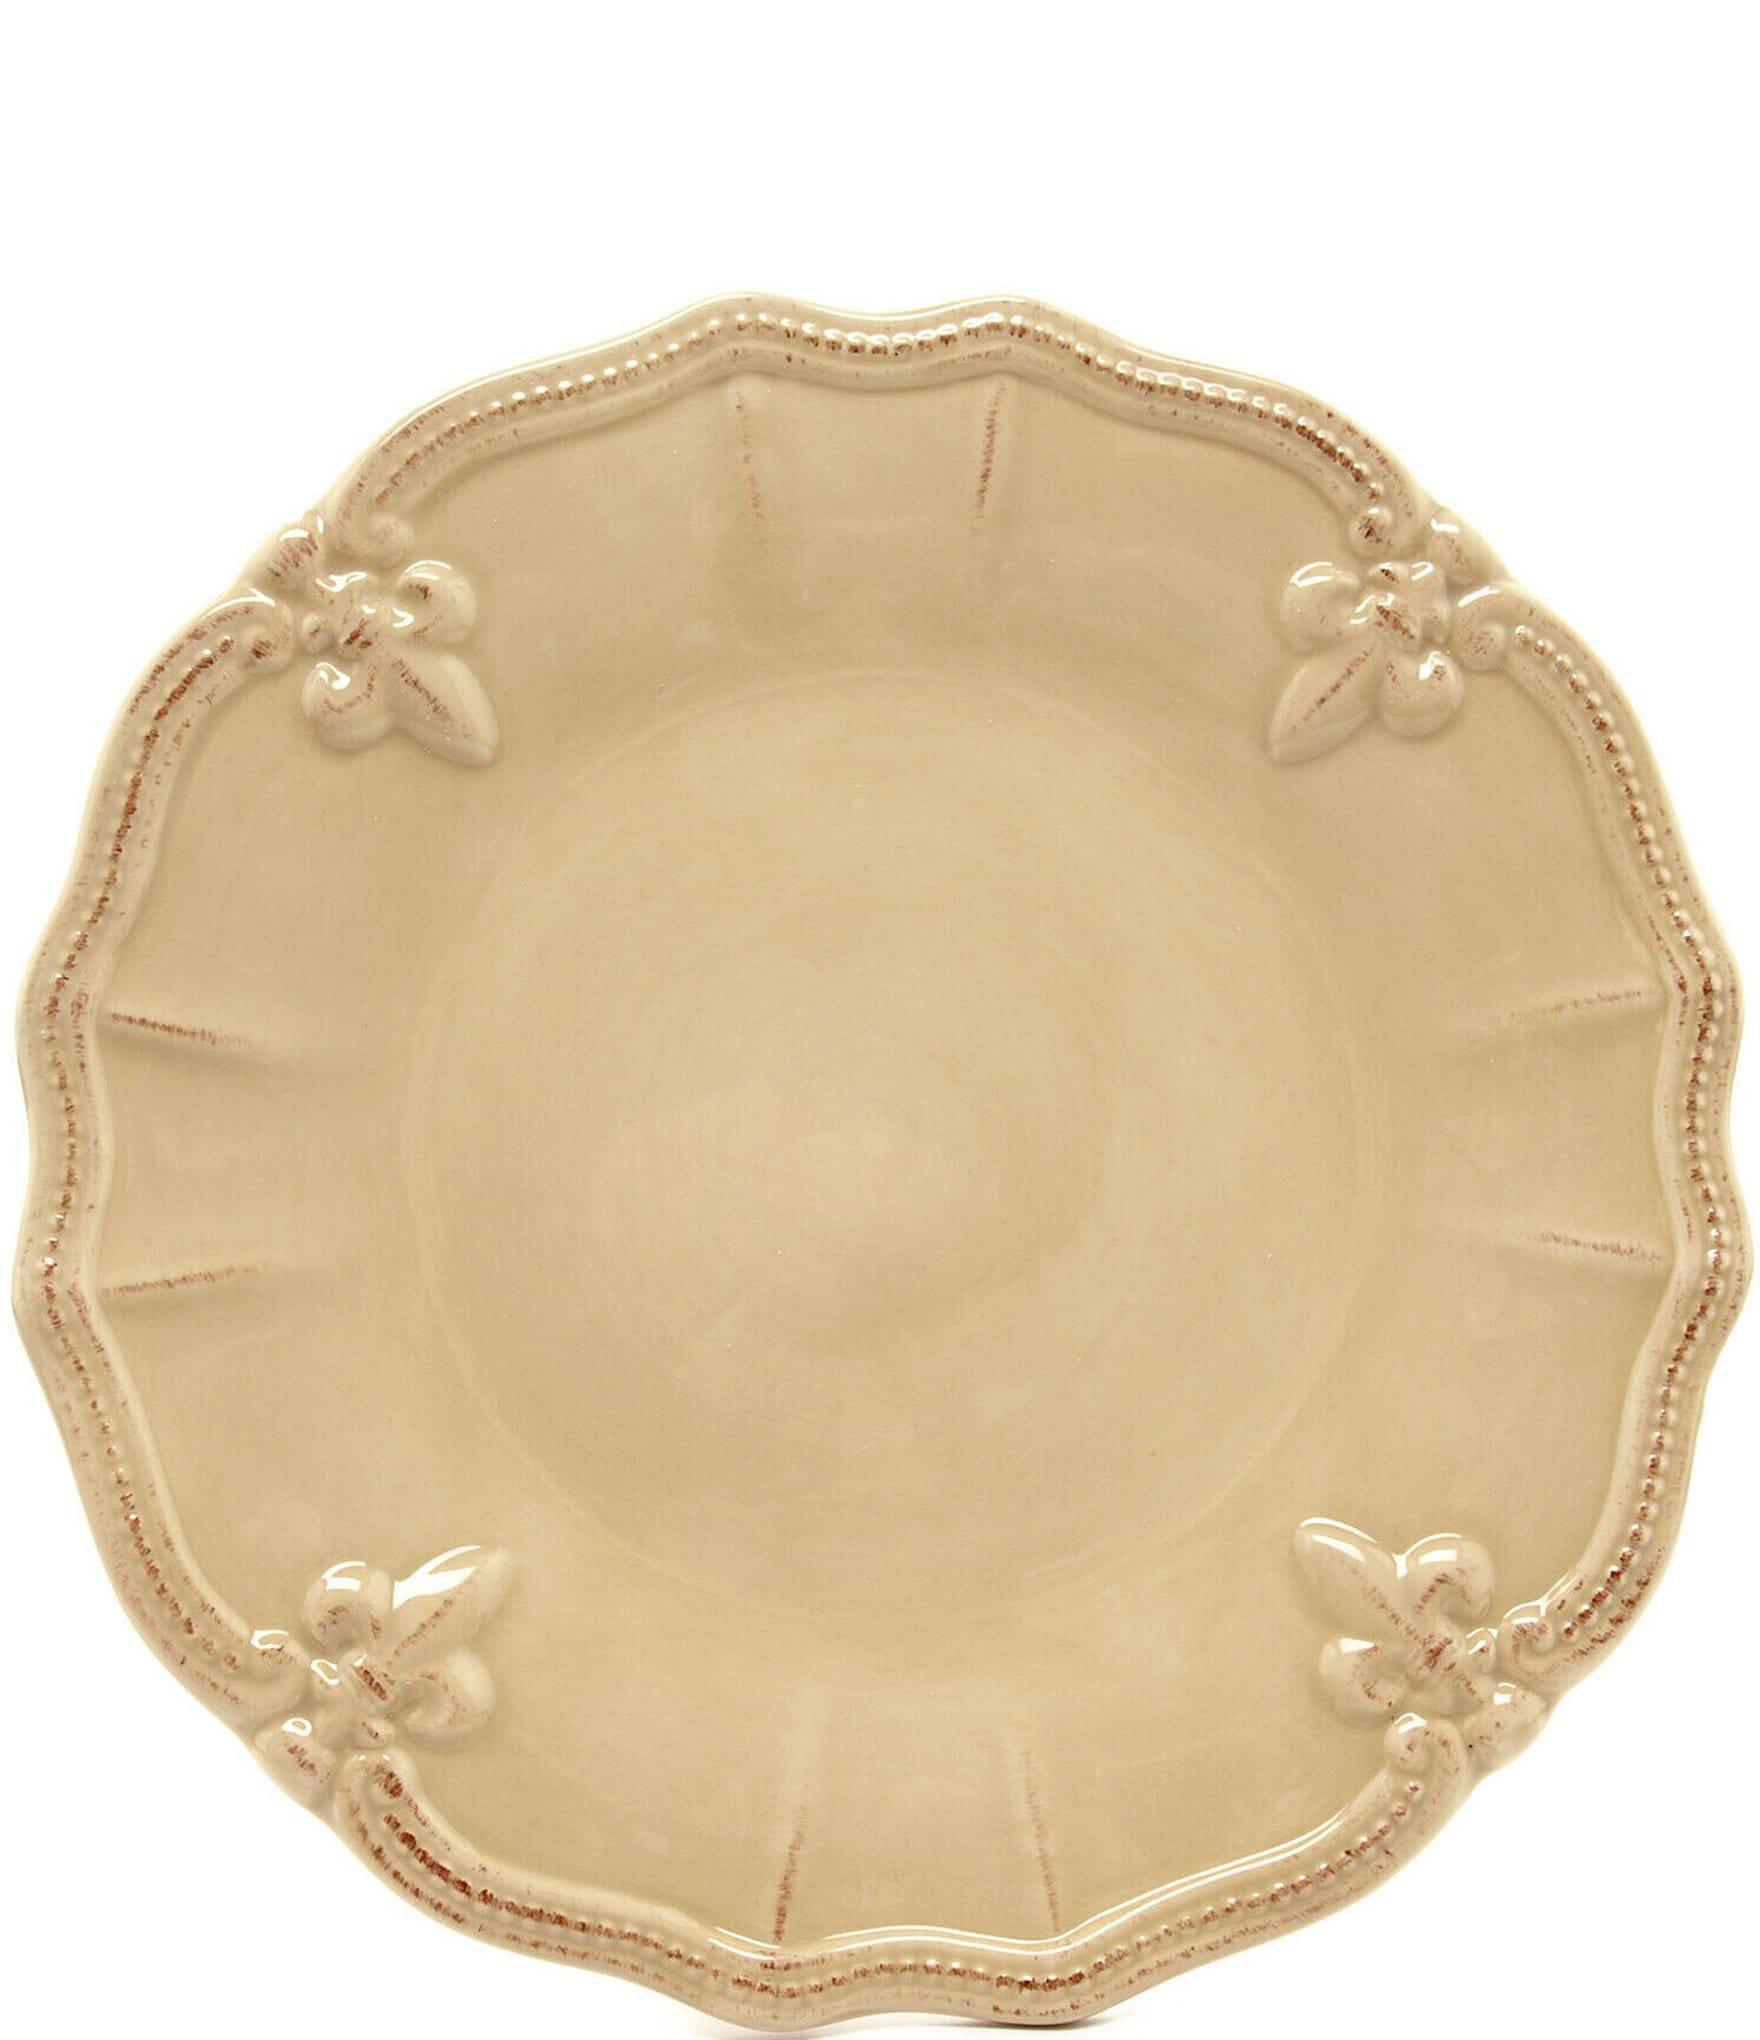 Artimino Fleur-de-Lis Earthenware Dinnerware   Dillards